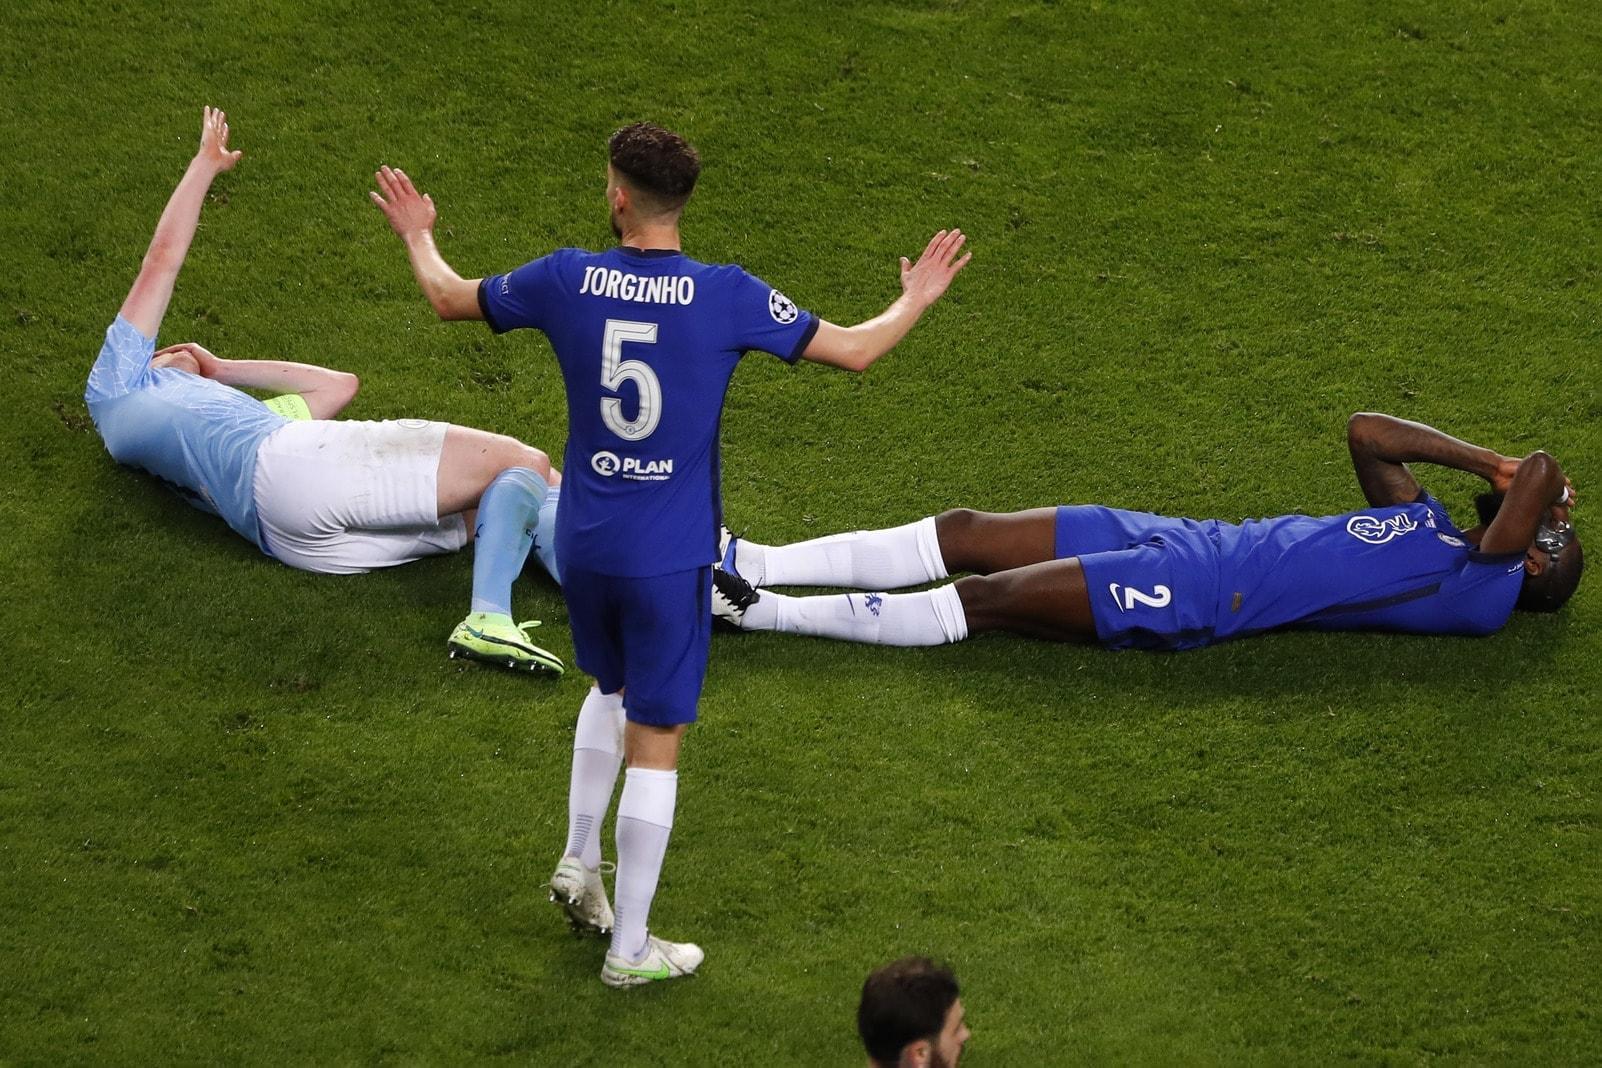 Manchester City - FC Chelsea De Bruyne Rüdiger